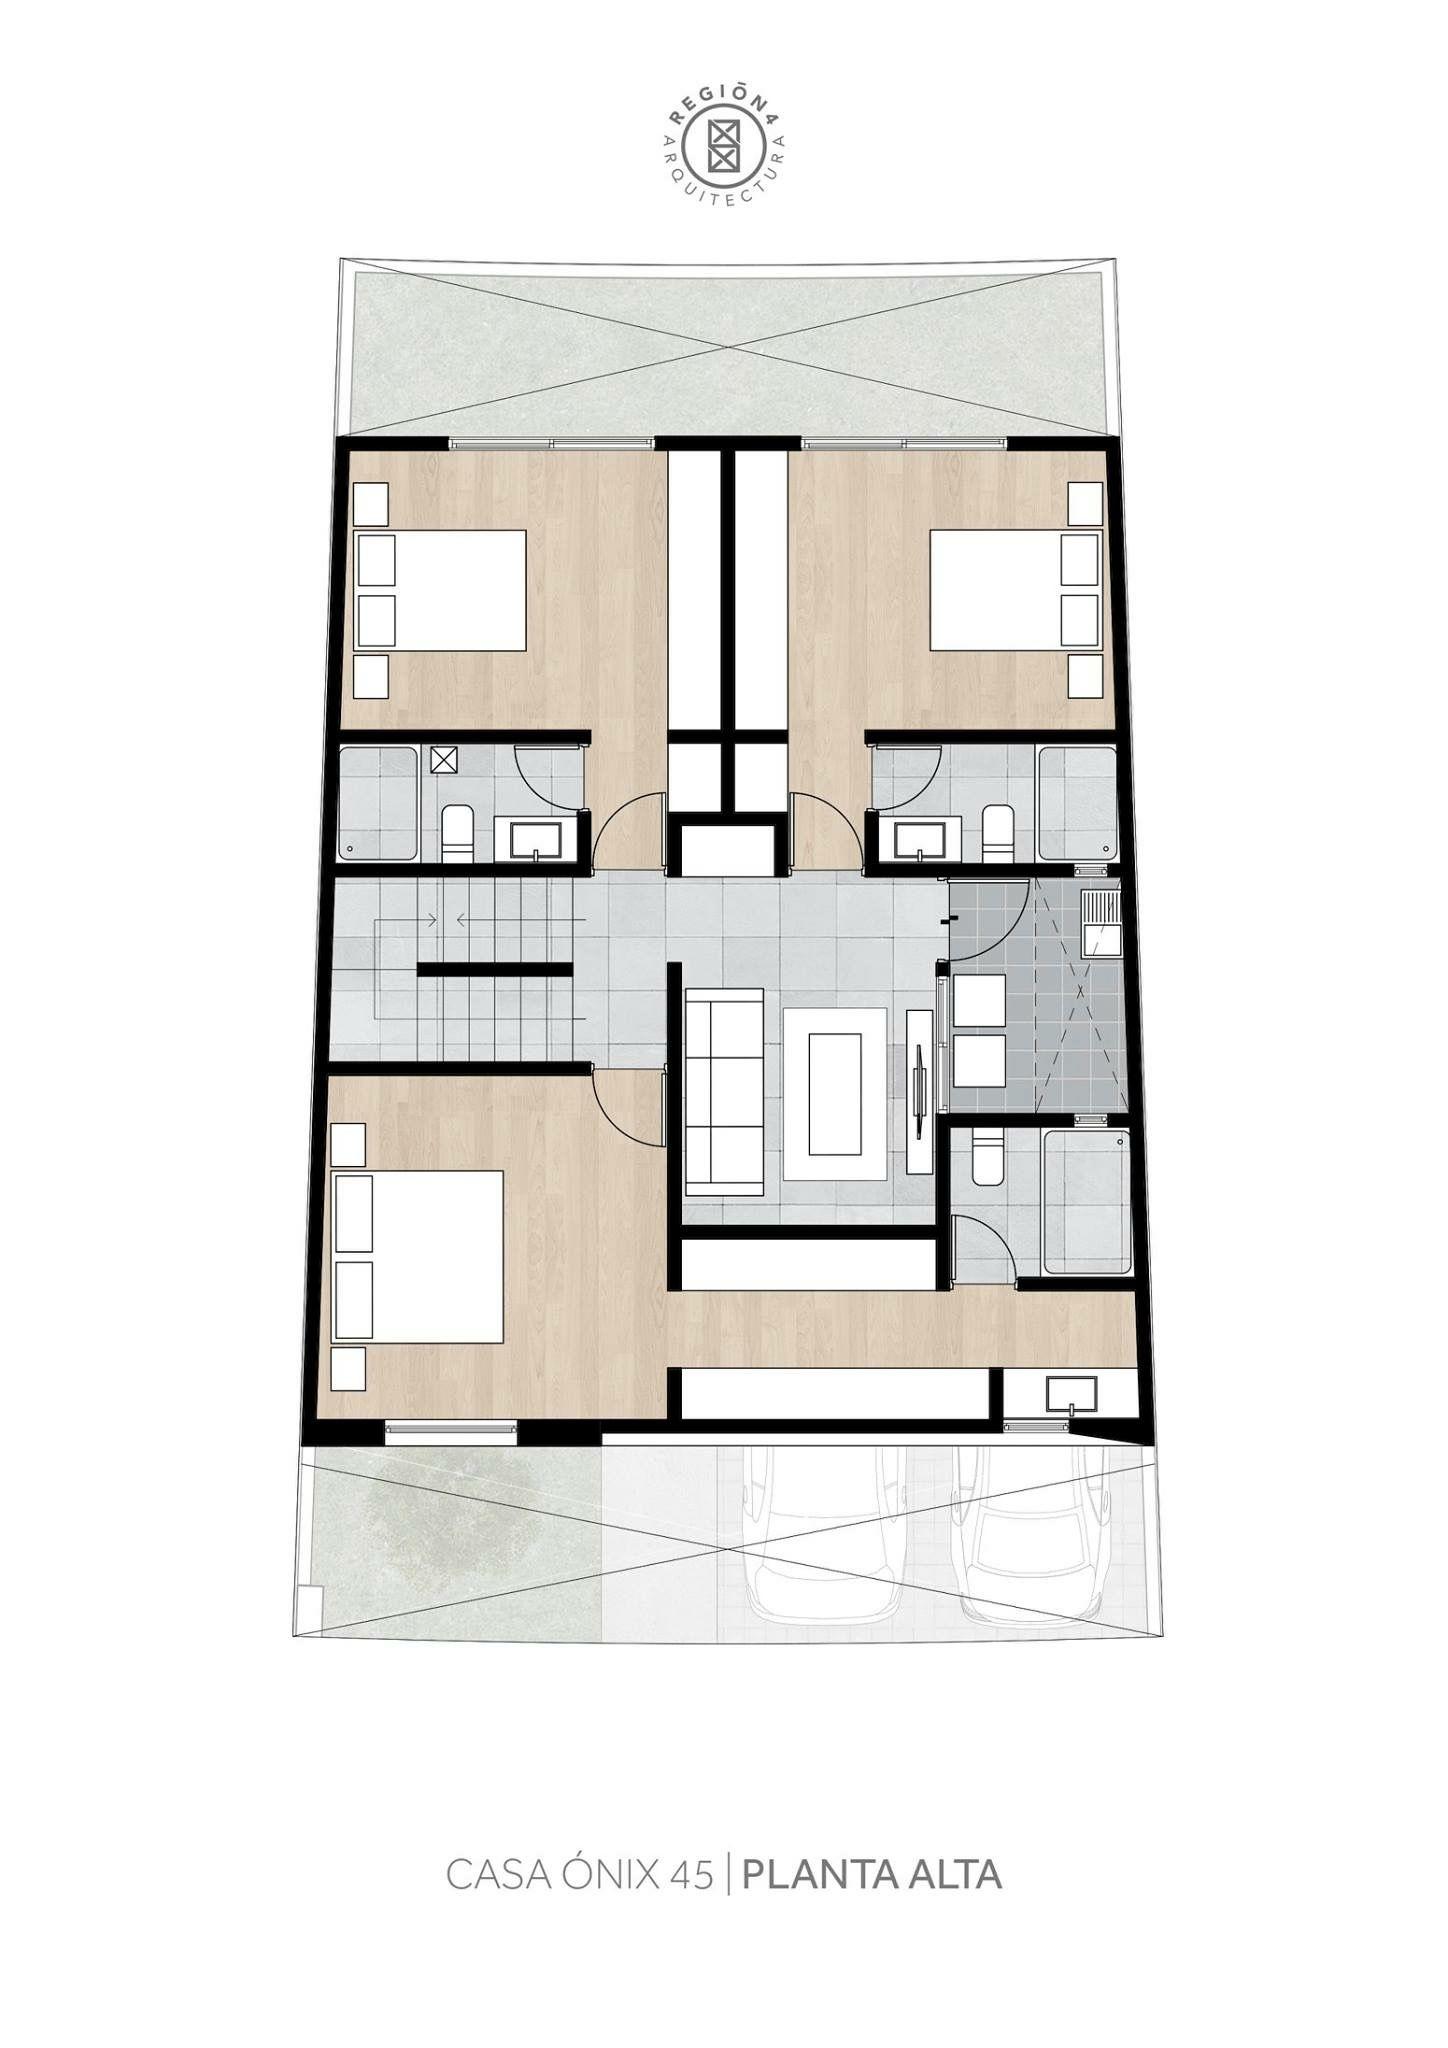 Pin By Pedro Duarte On Arq Pieles Pinterest Duplex Plans And House # Duartee Muebles